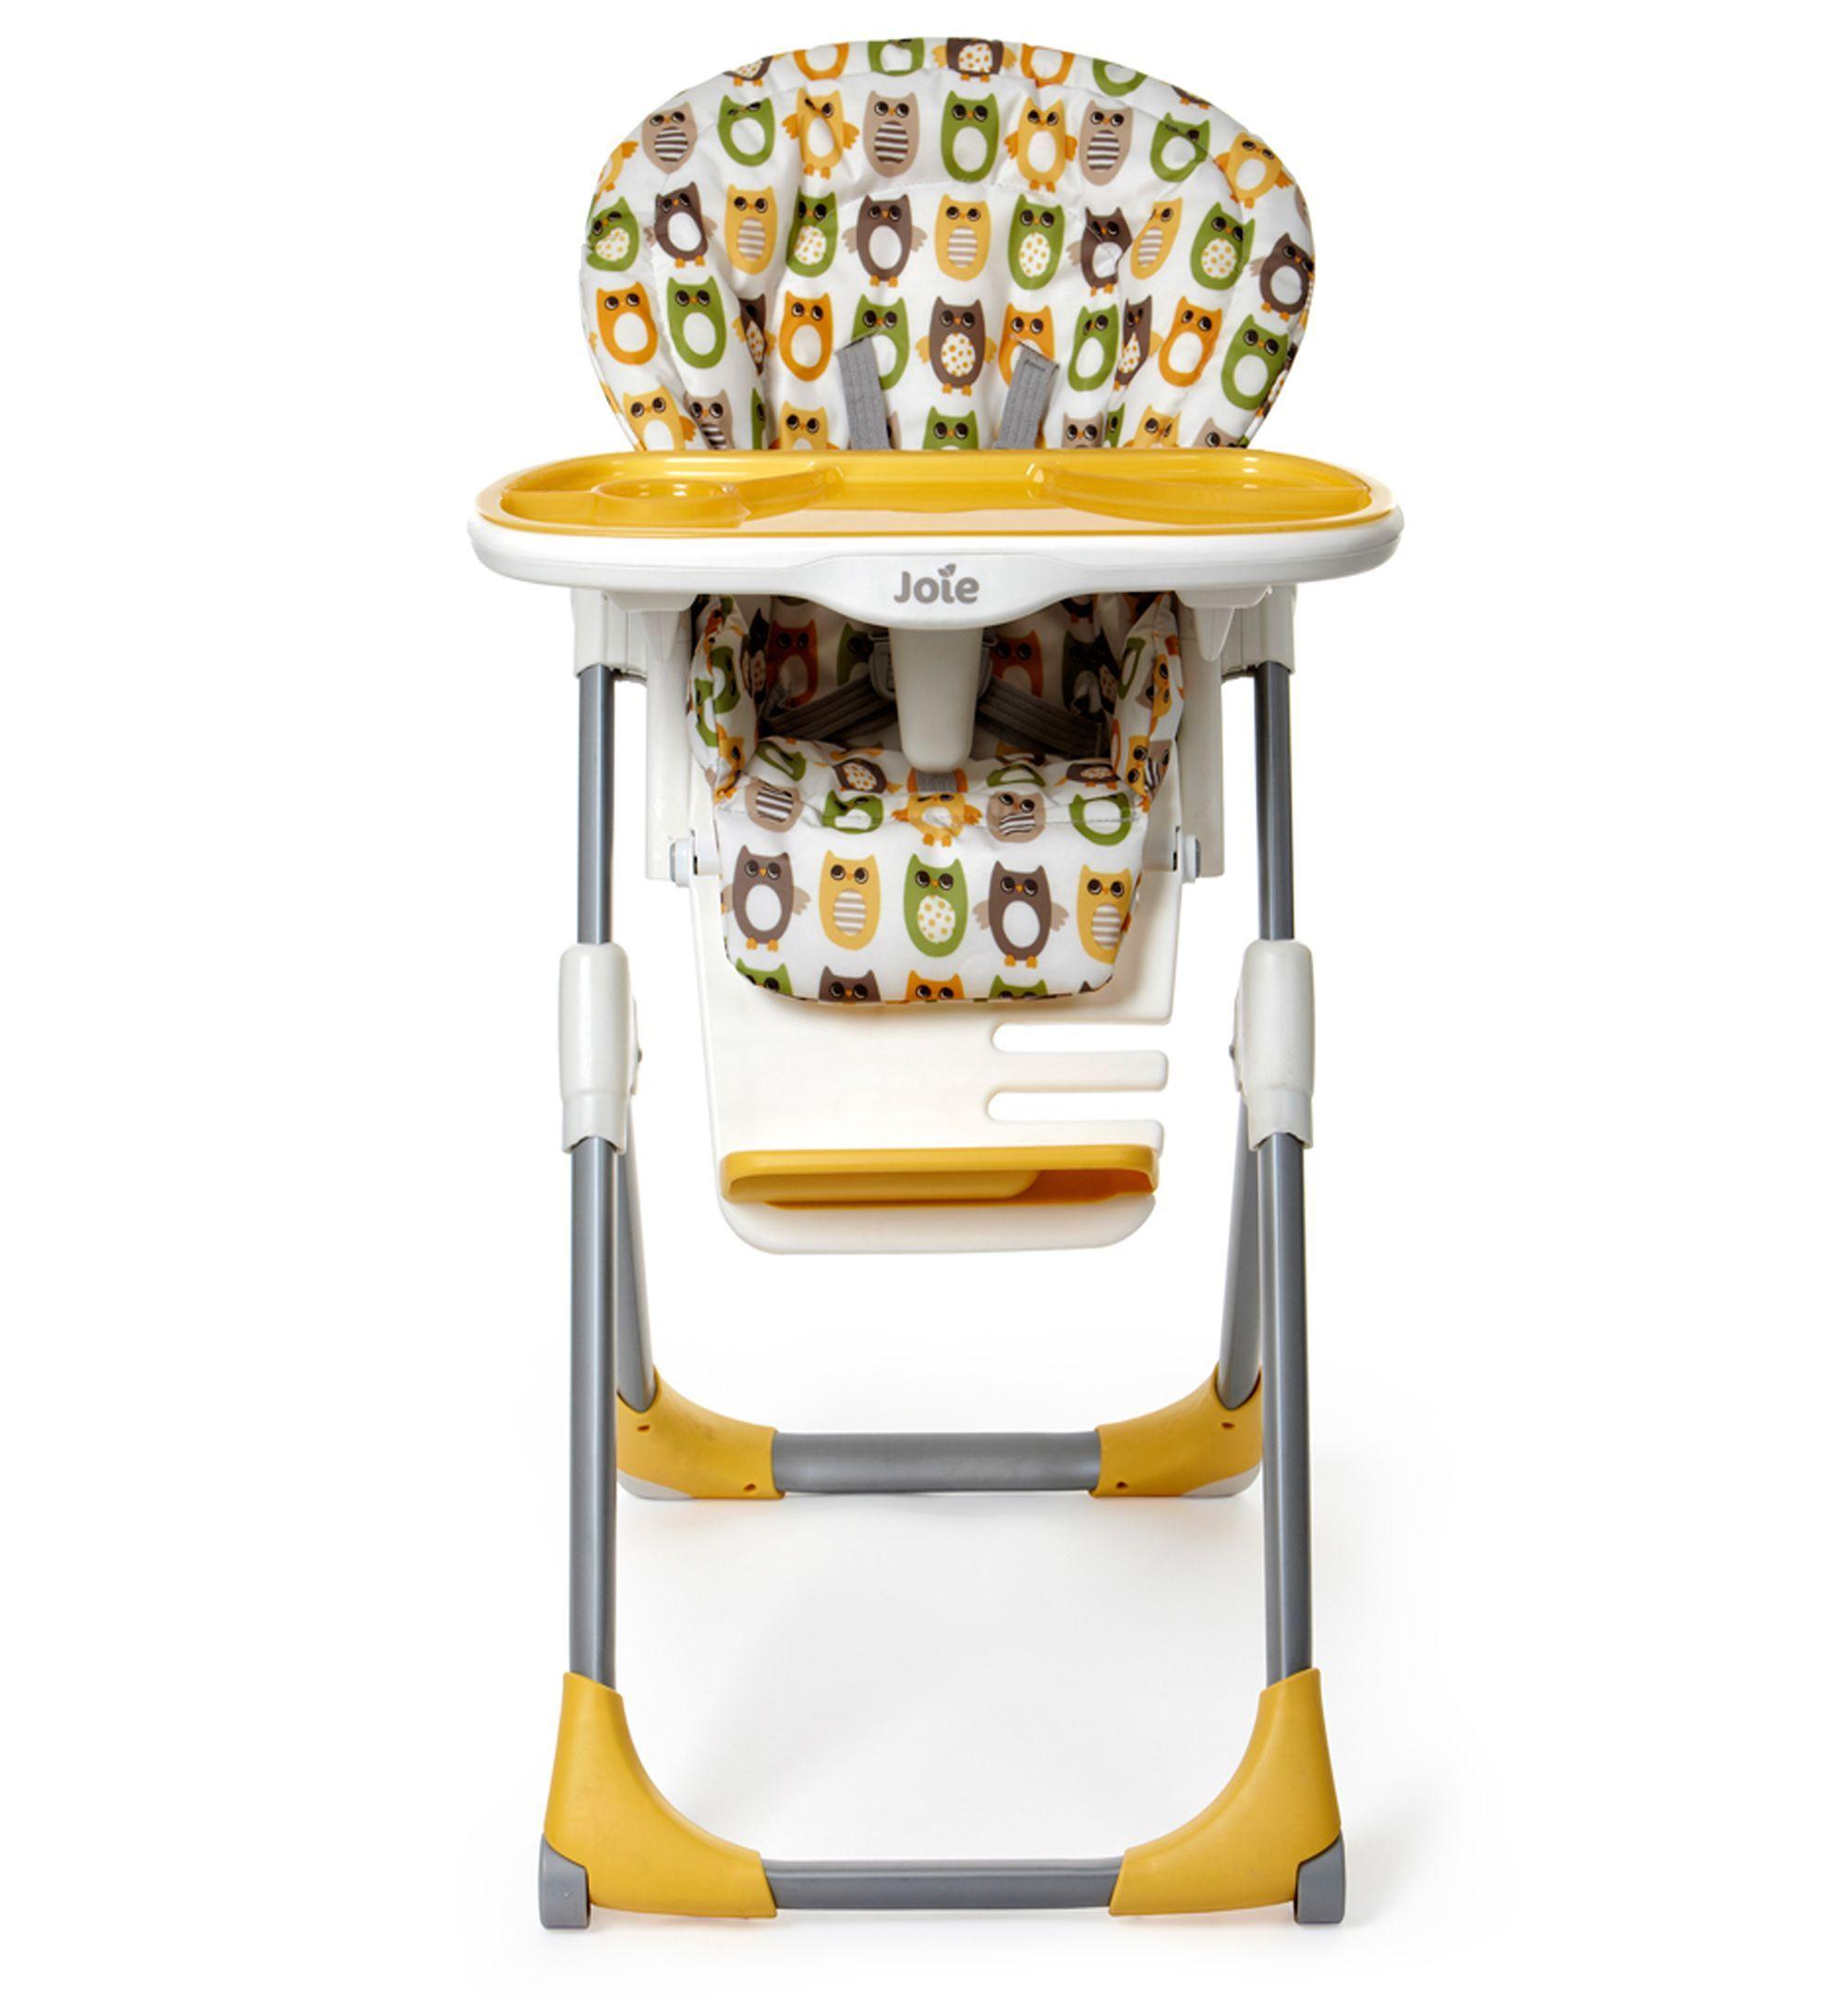 Joie Mimzy Highchair Owls High chair, Owl, Joie